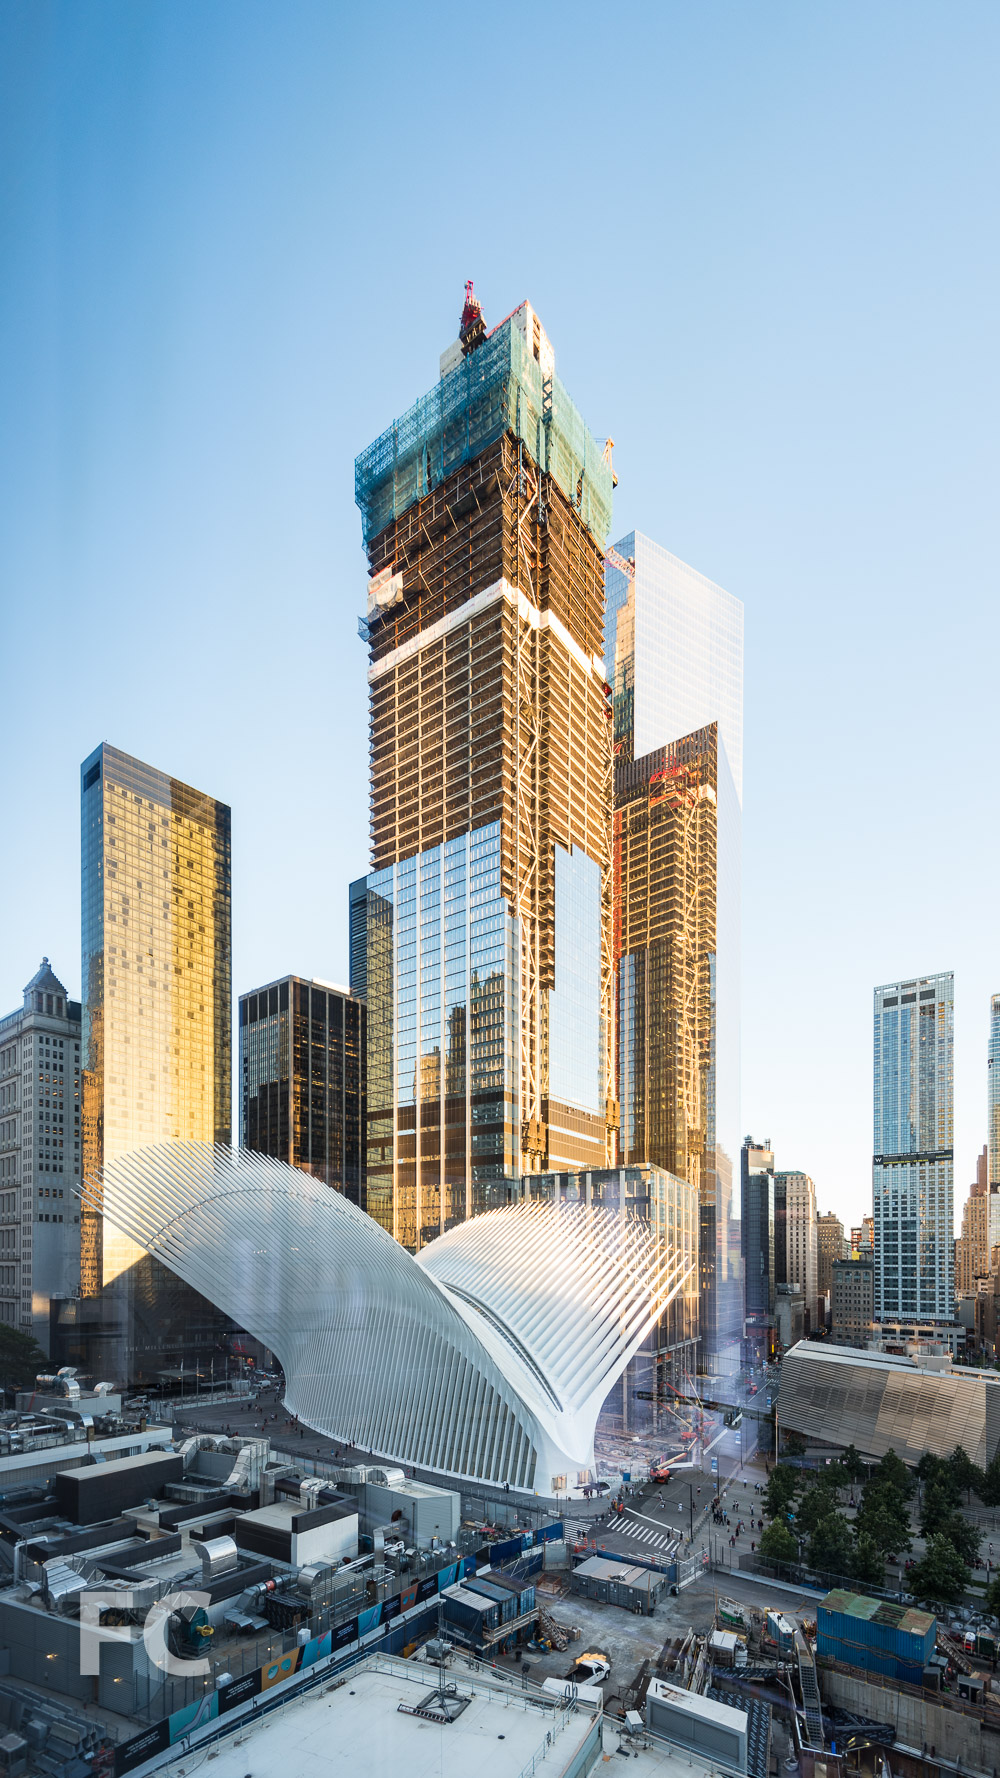 World Trade Center Transportation Hub (foreground), 3 World Trade Center (center), and 4 World Trade Center (background).